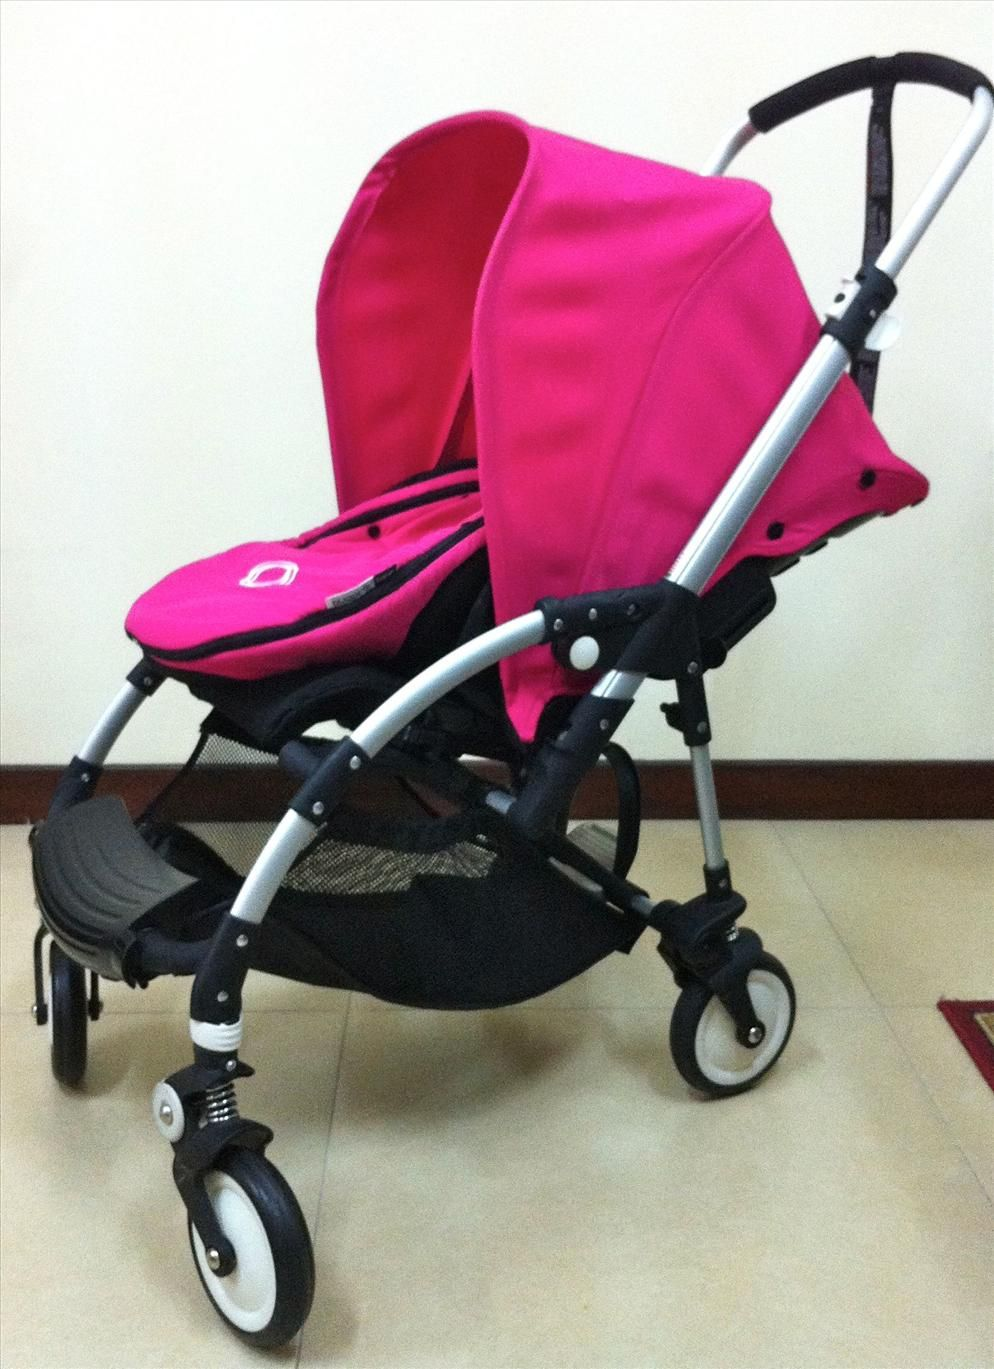 Used Bugaboo Strollers for Sale Preloved baby stroller